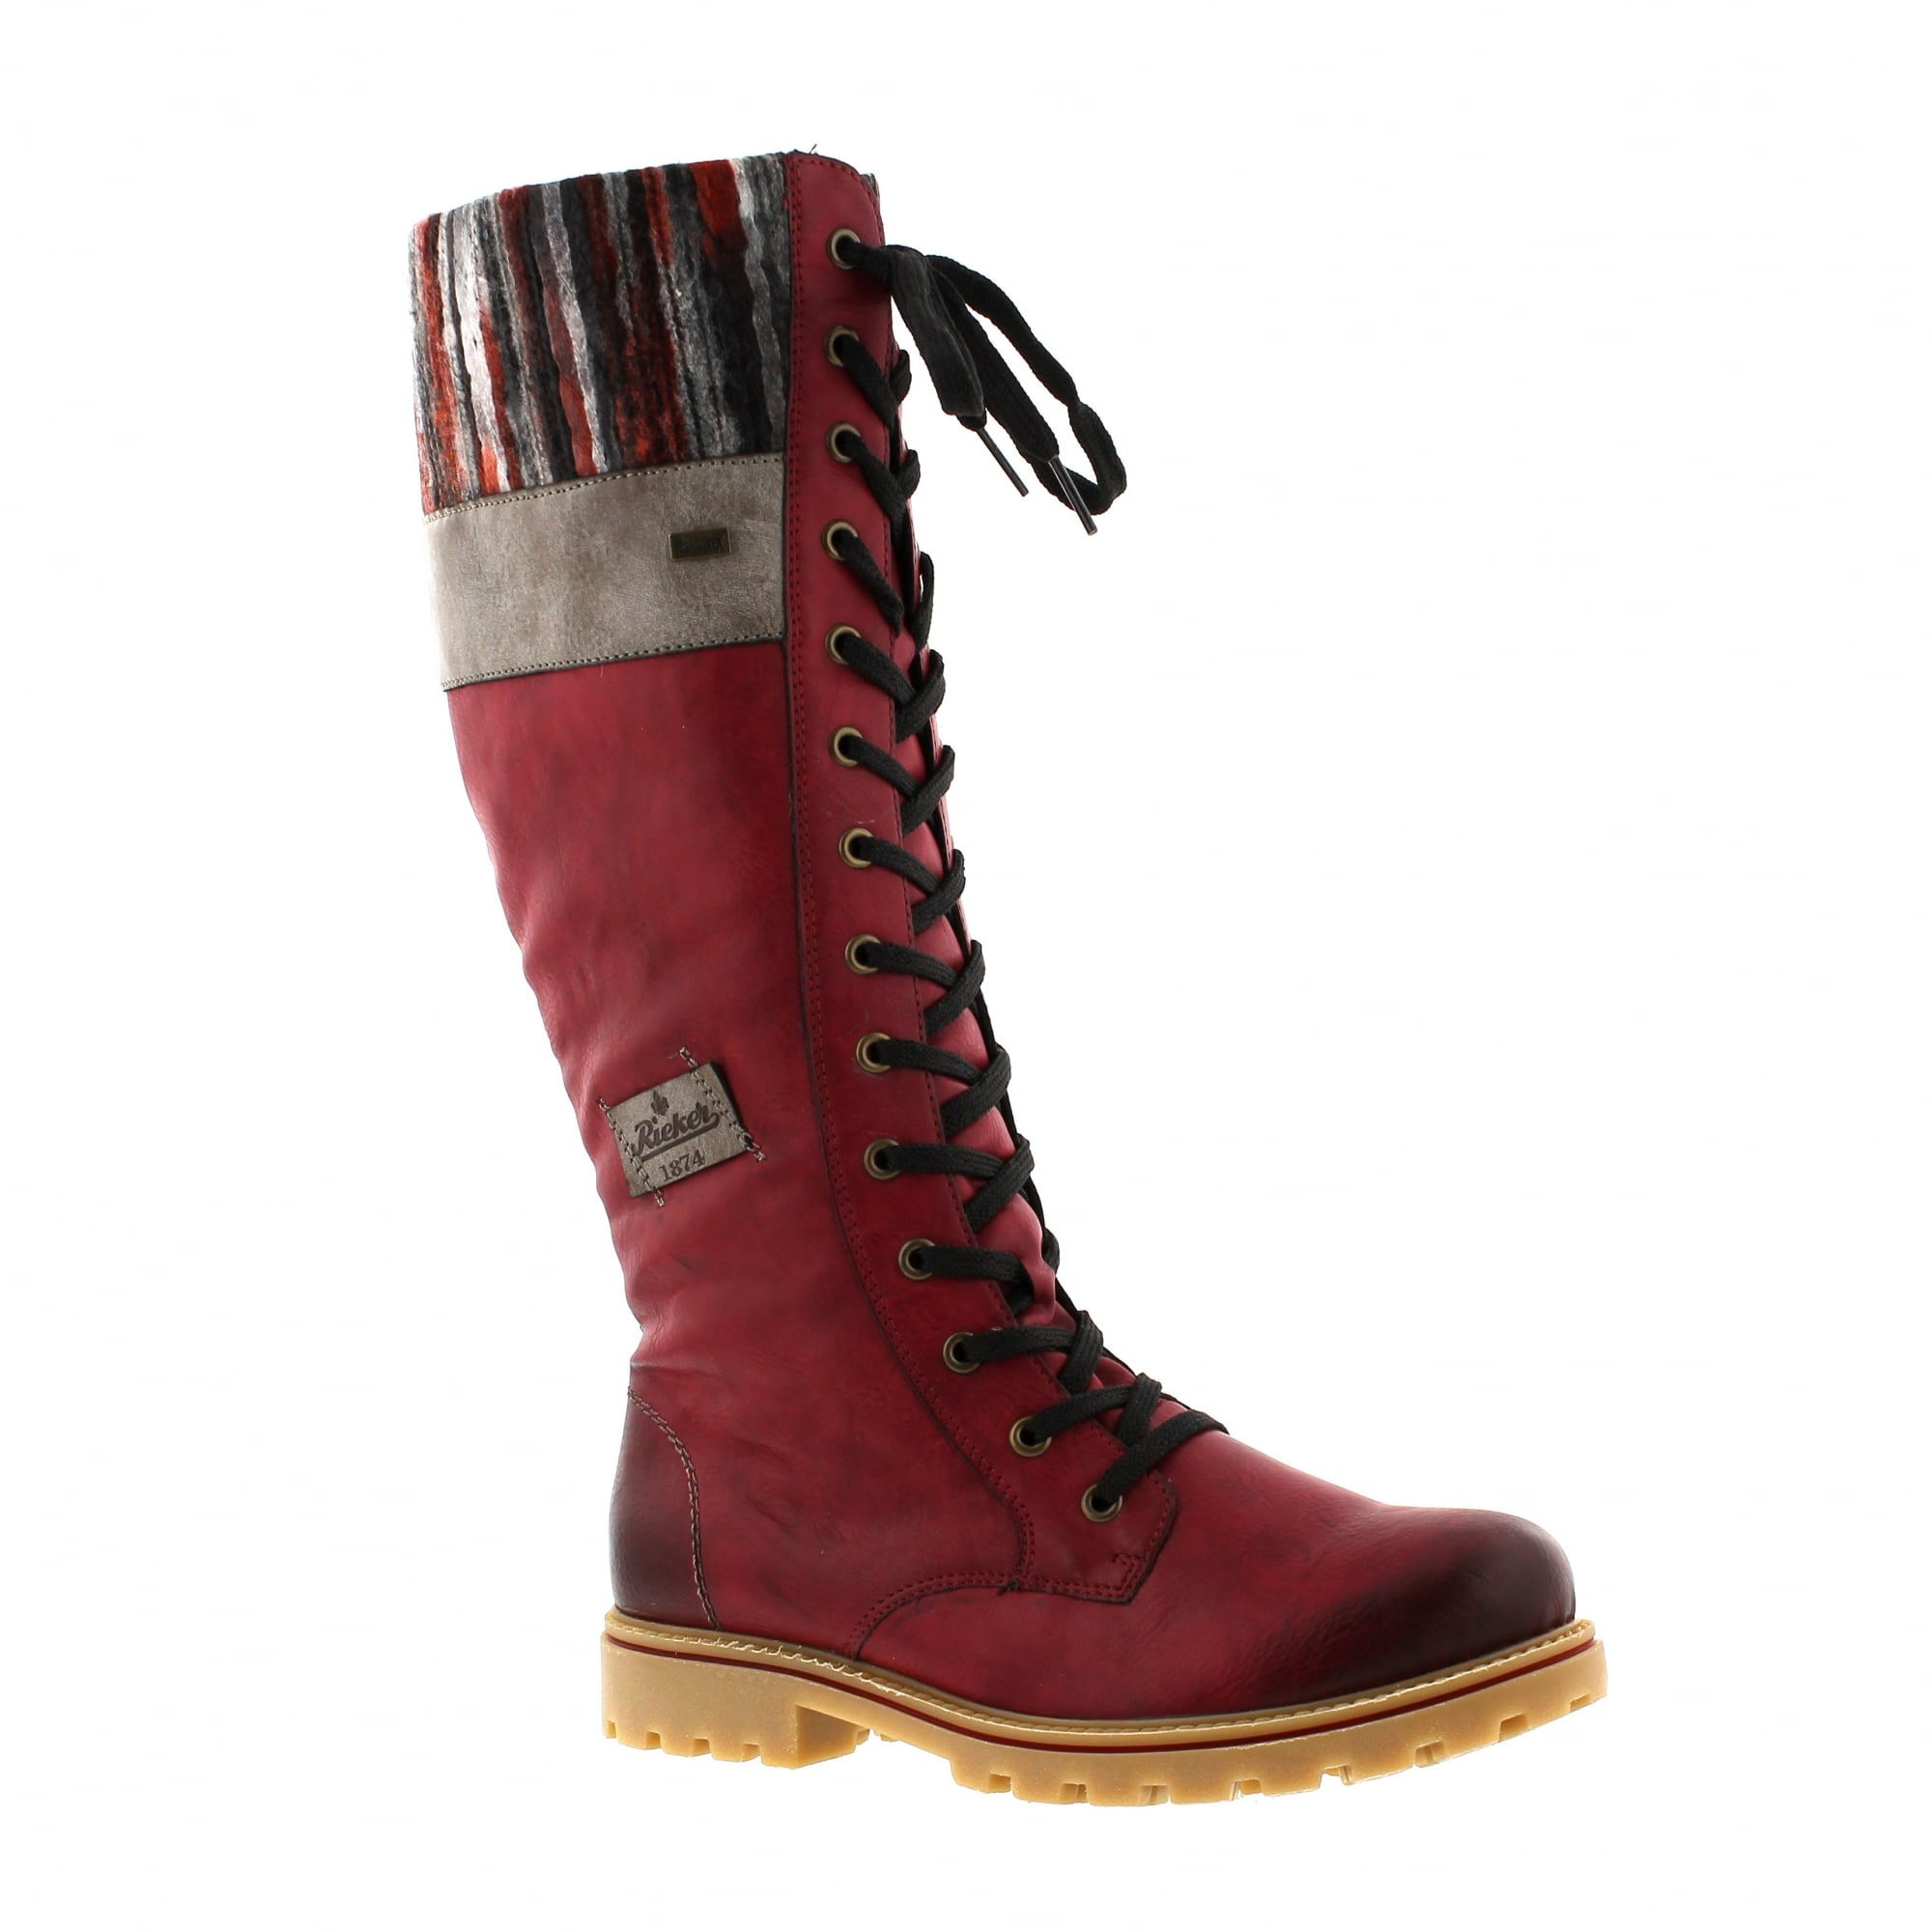 c785819e5 Rieker Z1442-35 Burgundy/Grey Womens Knee High Boots | Rogerson Shoes